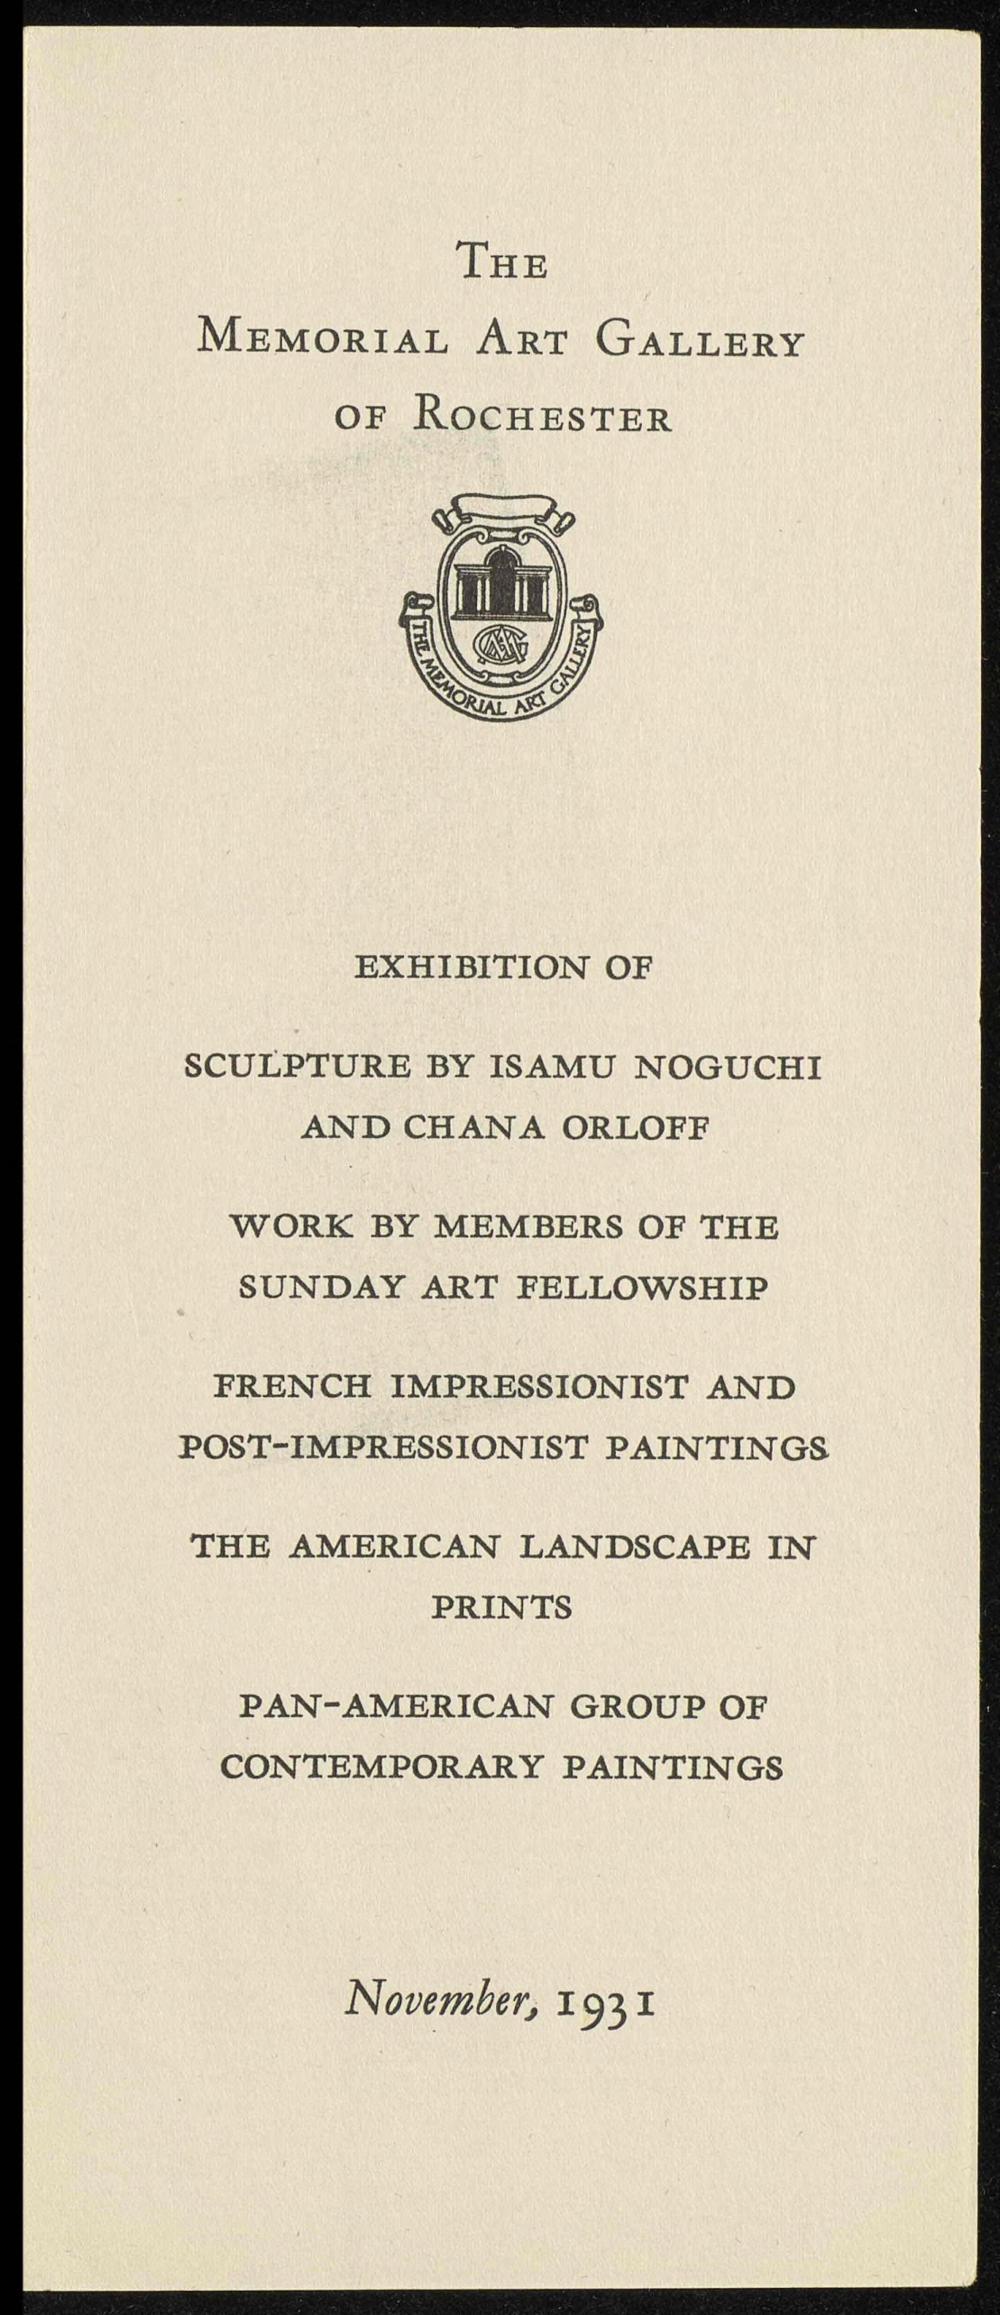 The Memorial Art Gallery of Rochester exhibition catalog